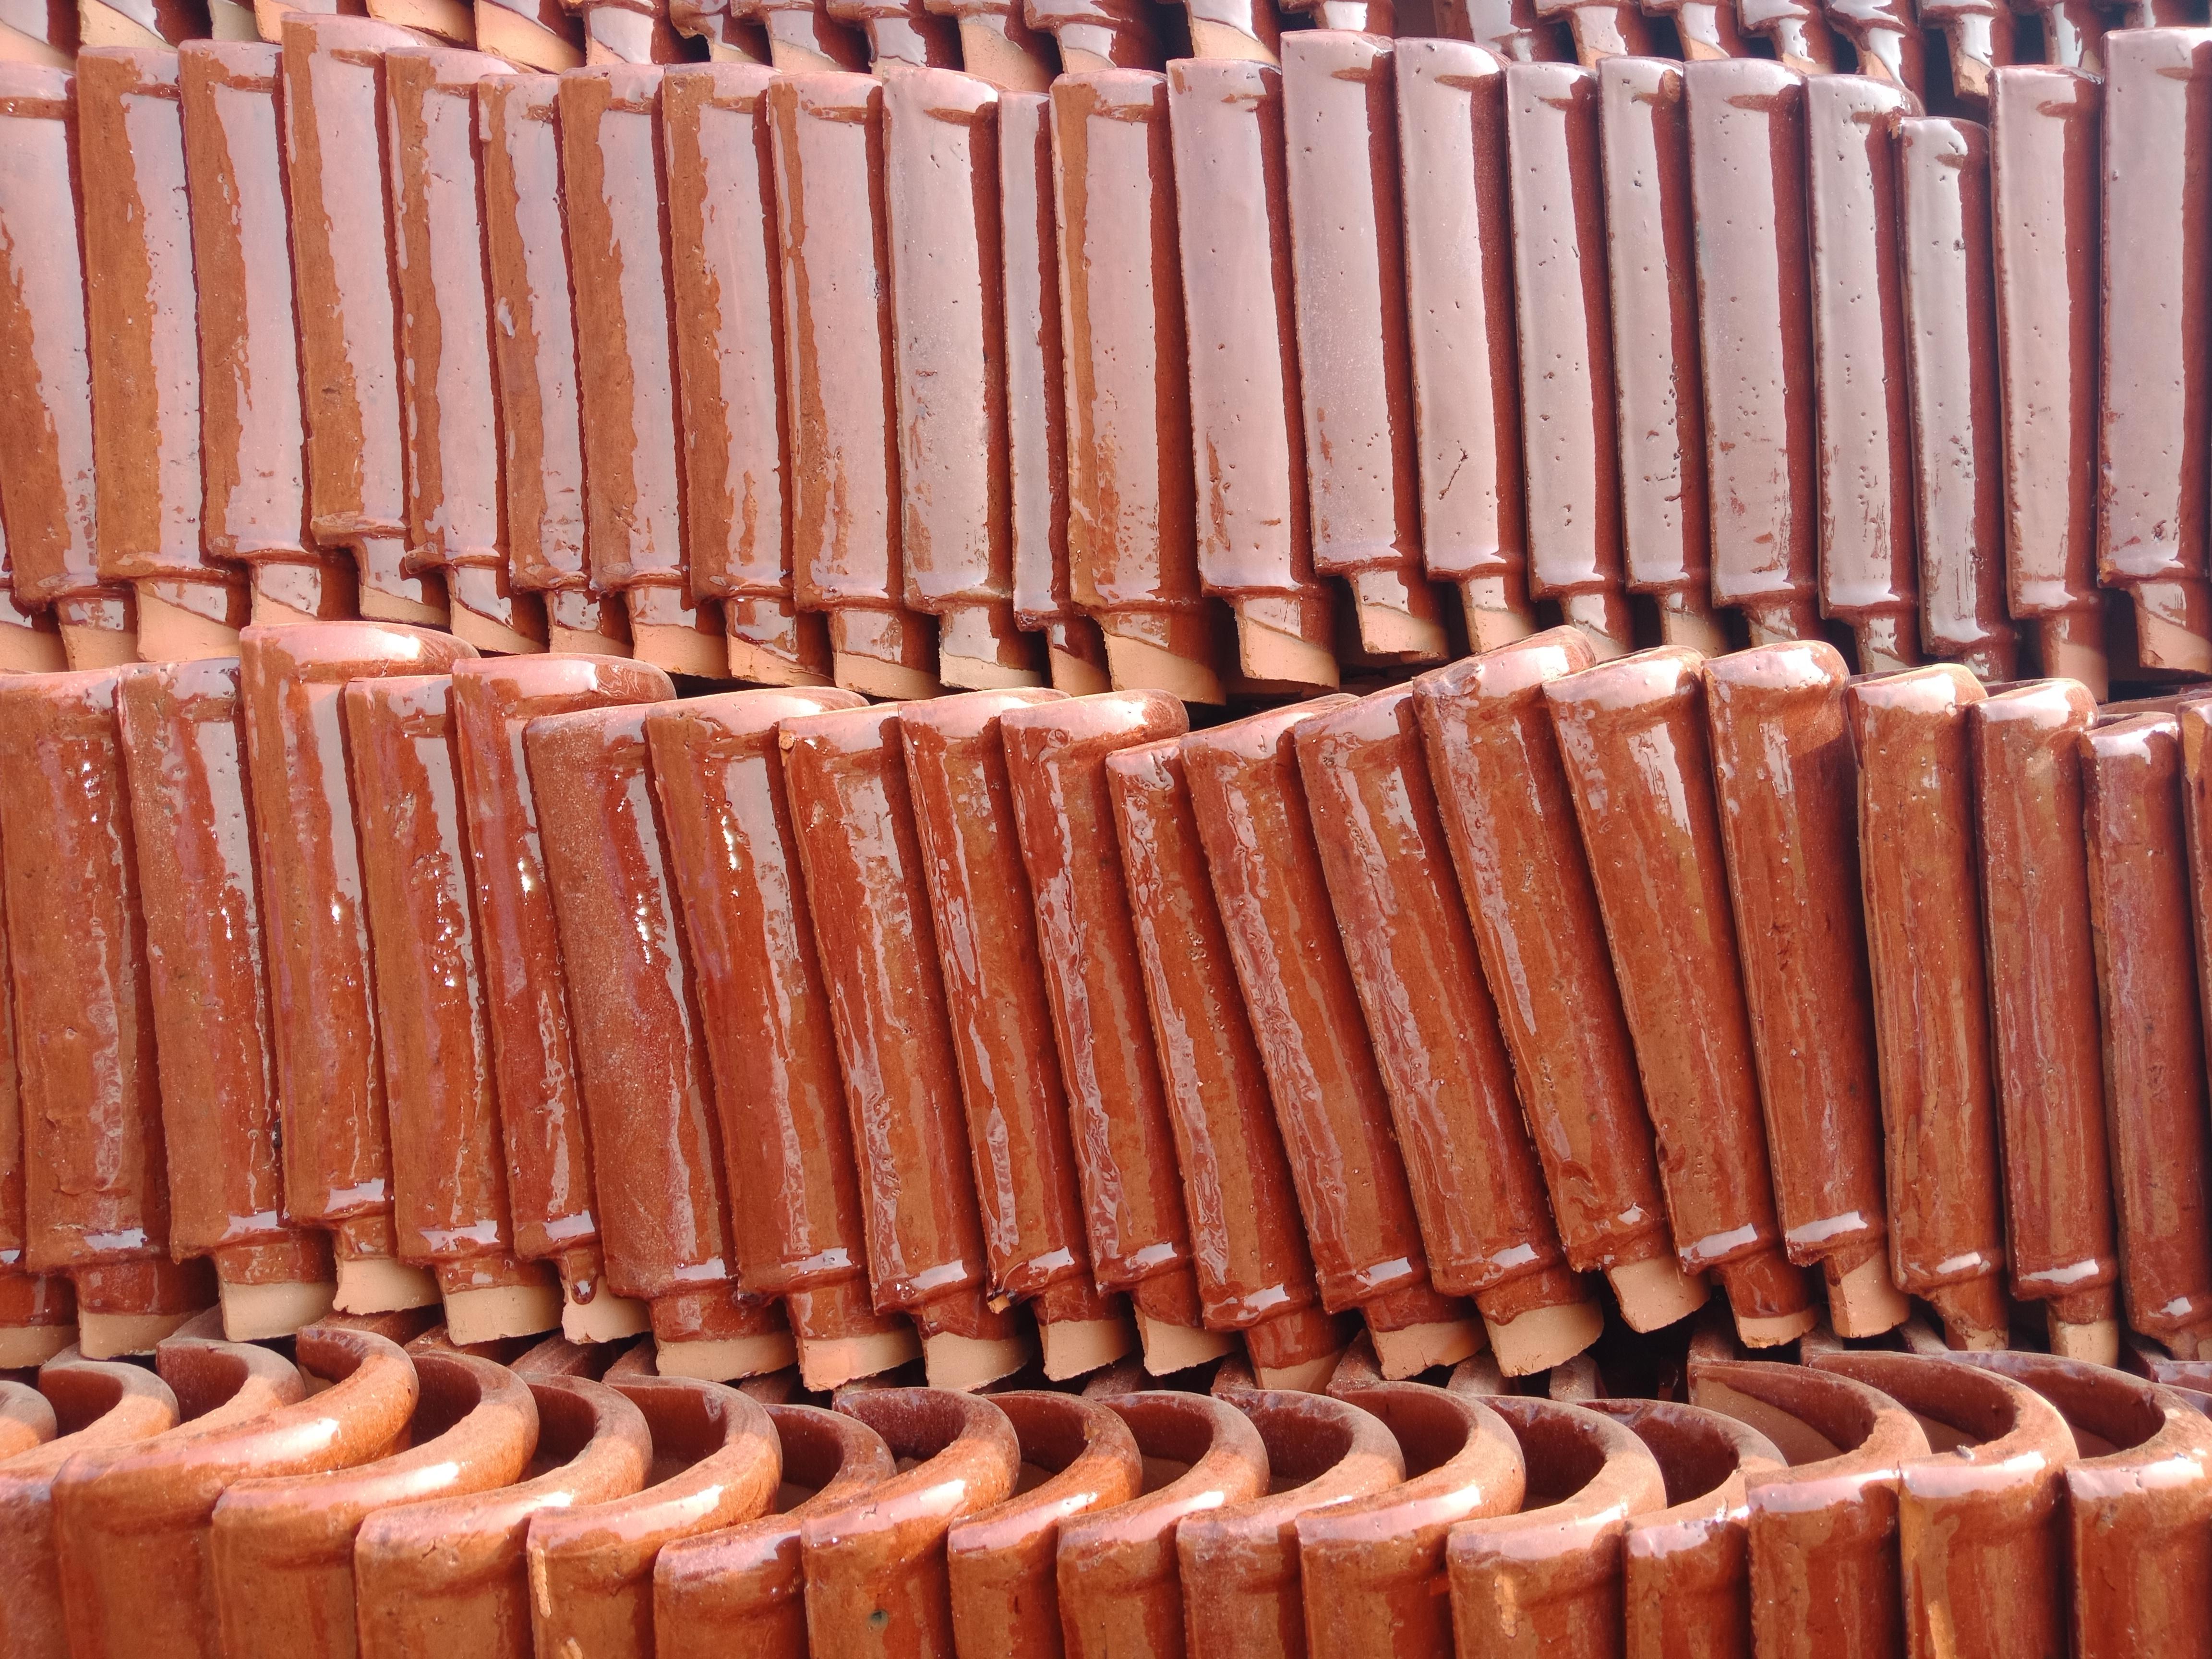 1 Pak Clay Khaprail Tiles Manufacturer in Pakistan Terracotta Roof Tiles Design Images.